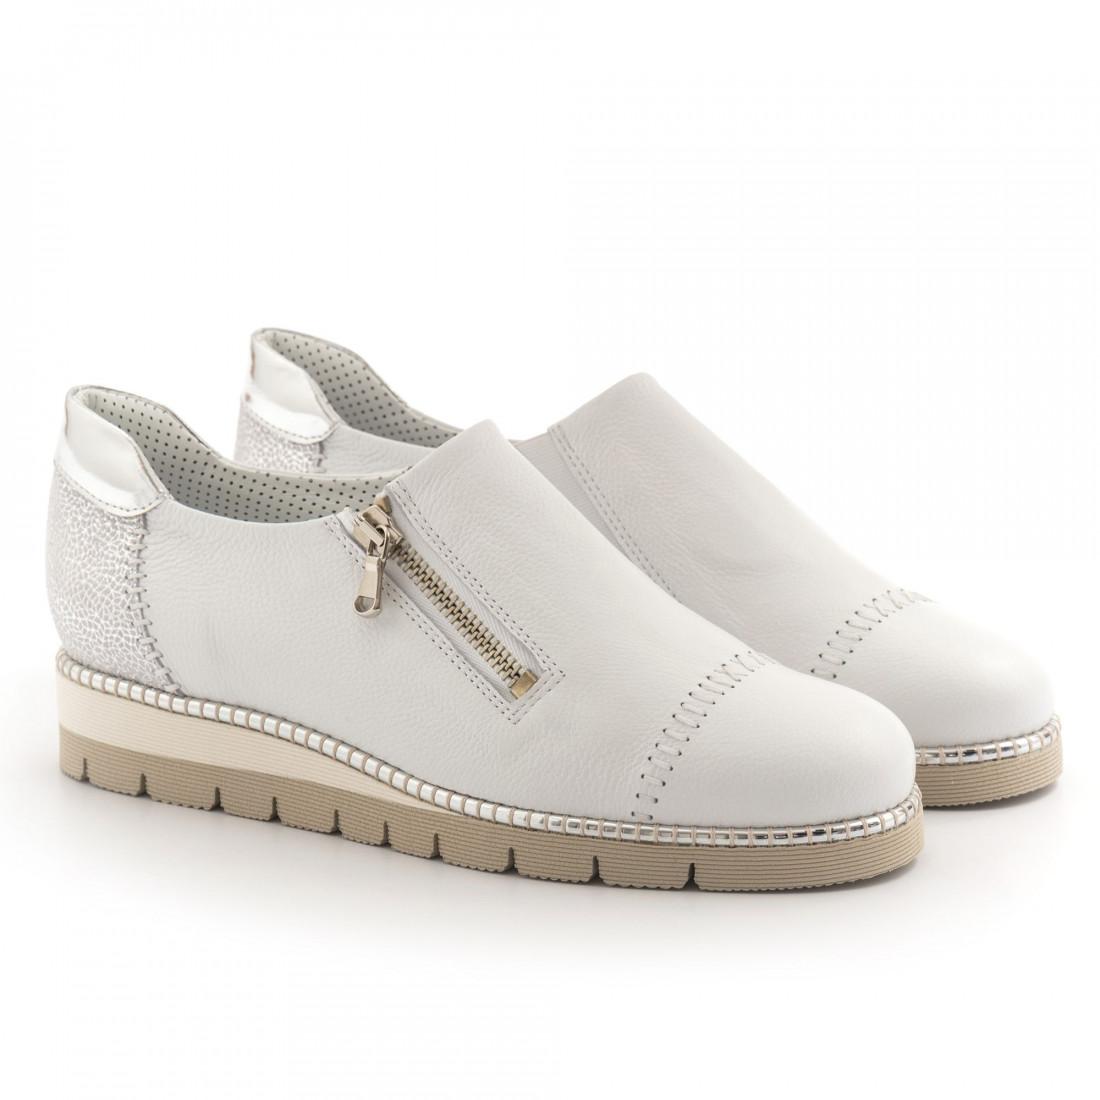 sneakers woman alfredo giantin 6287pony bianco 4523